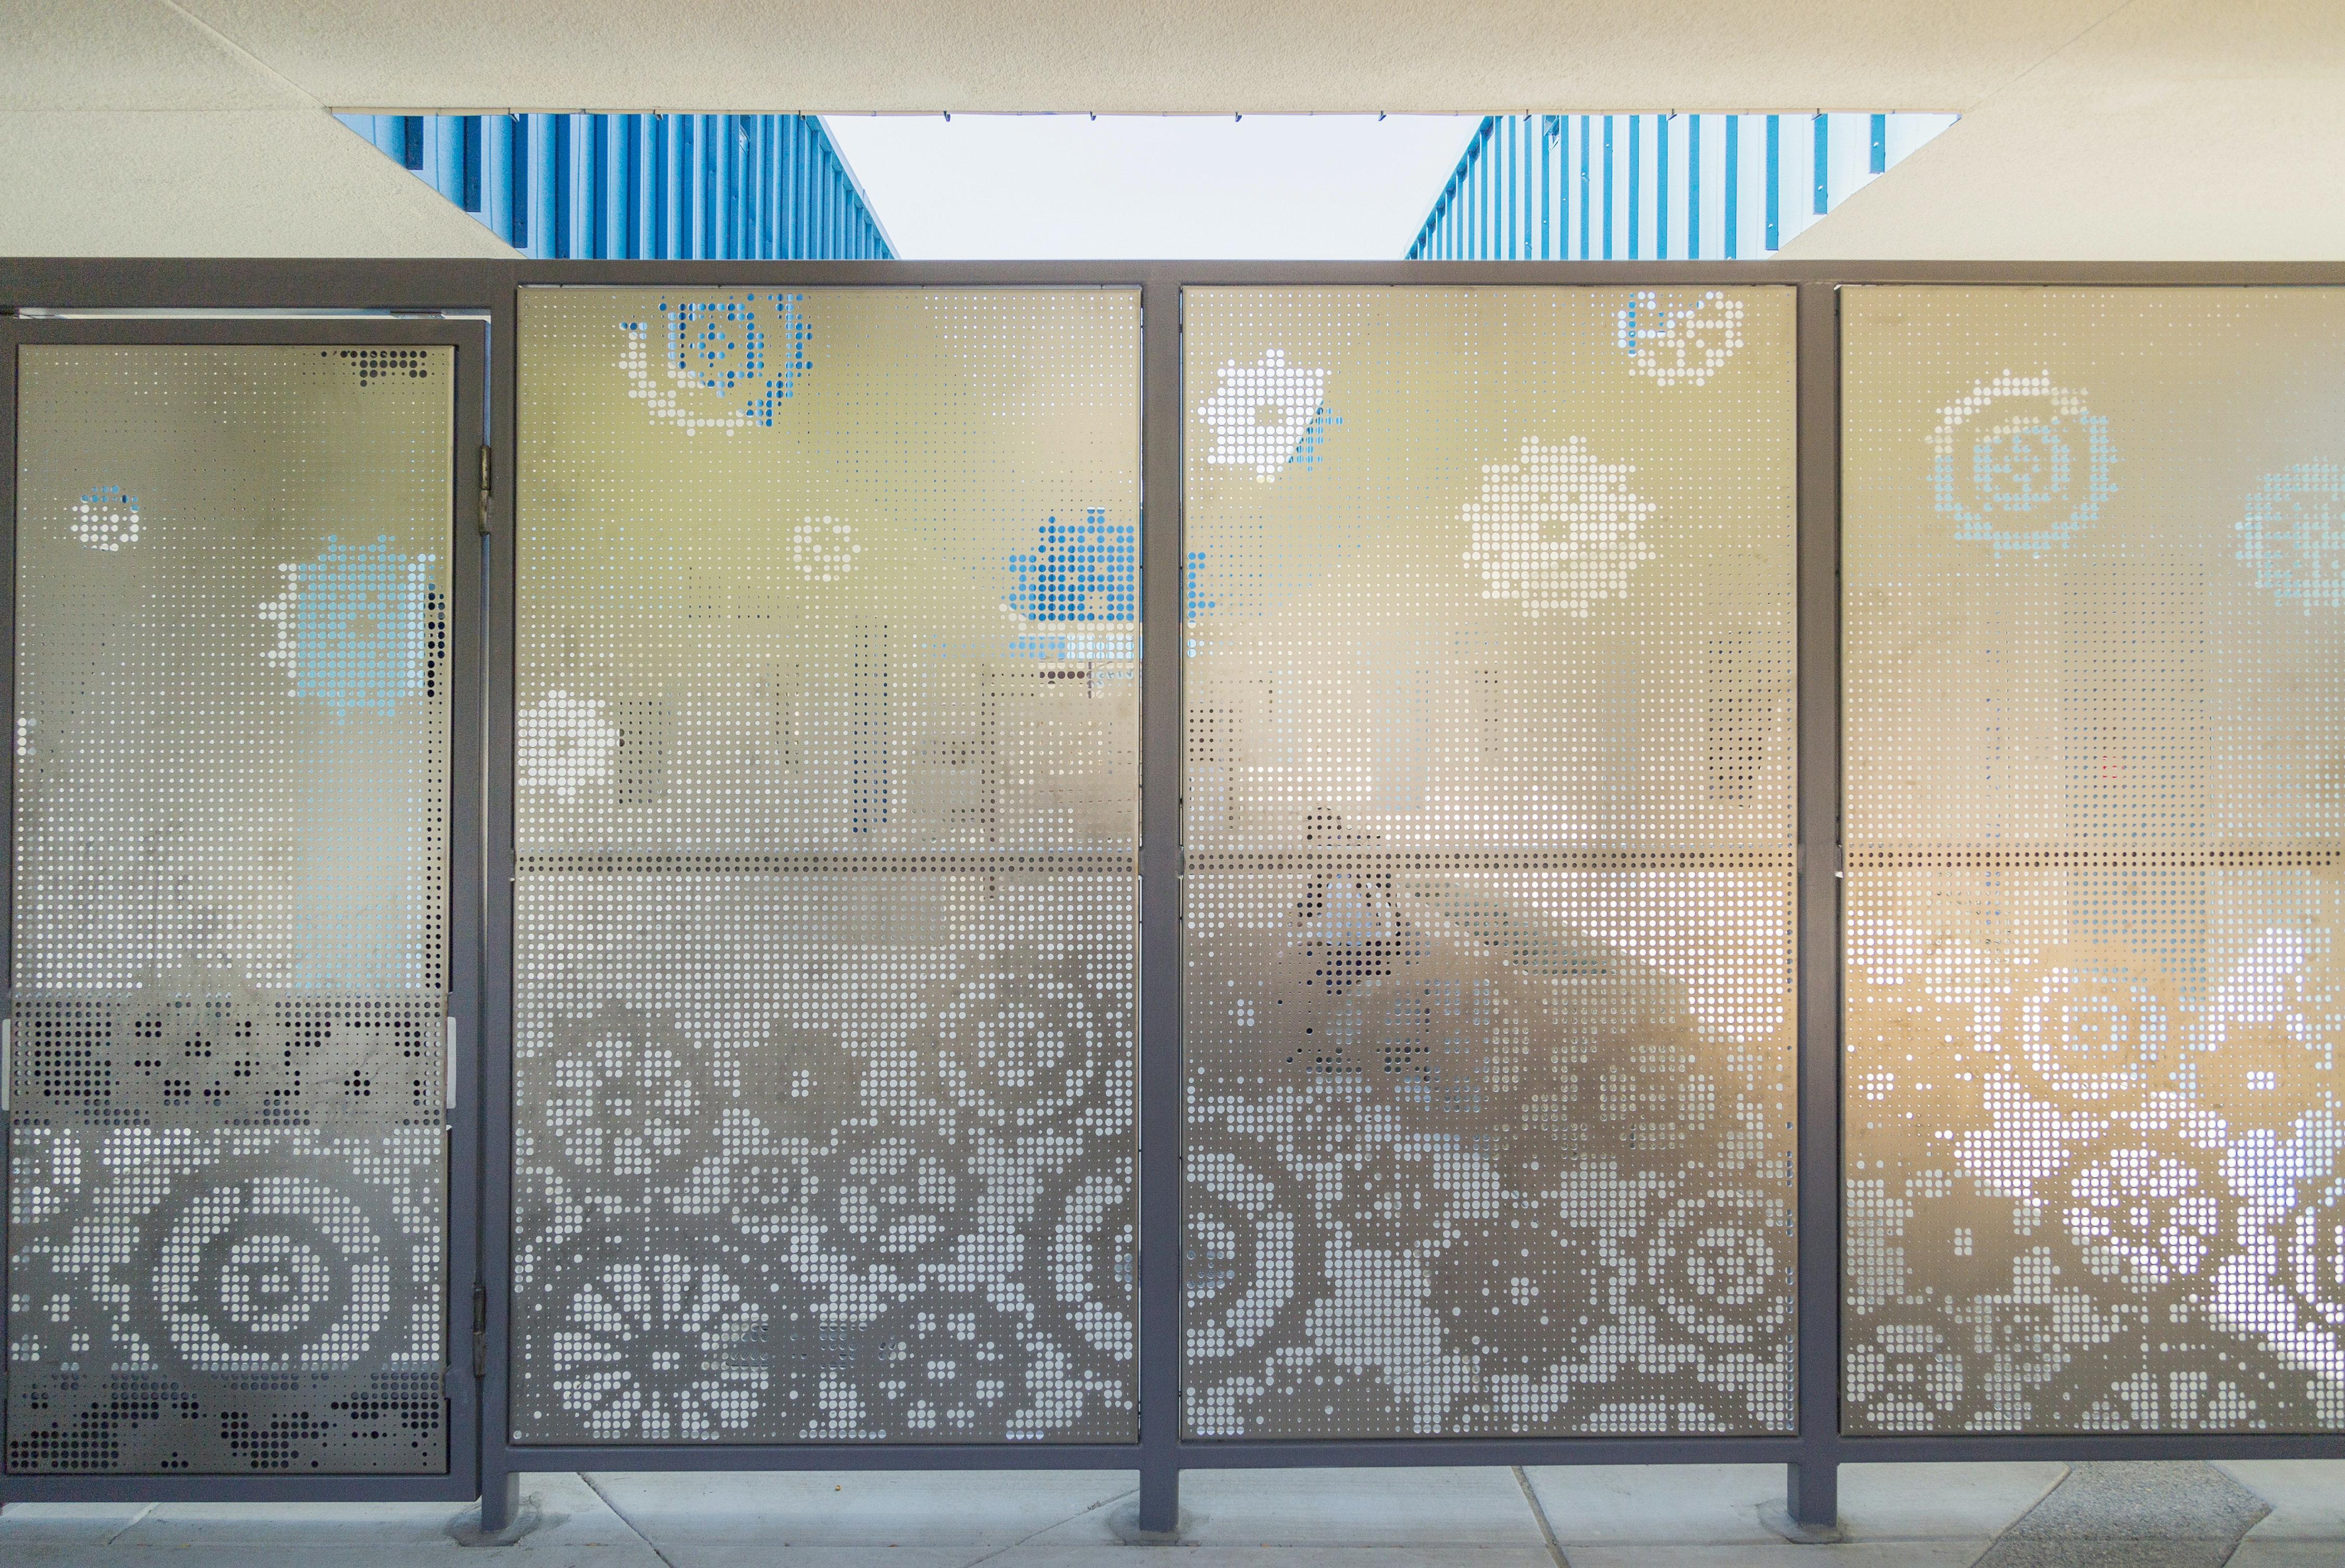 & Washington Elementary School Privacy Screenwalls | Zahner